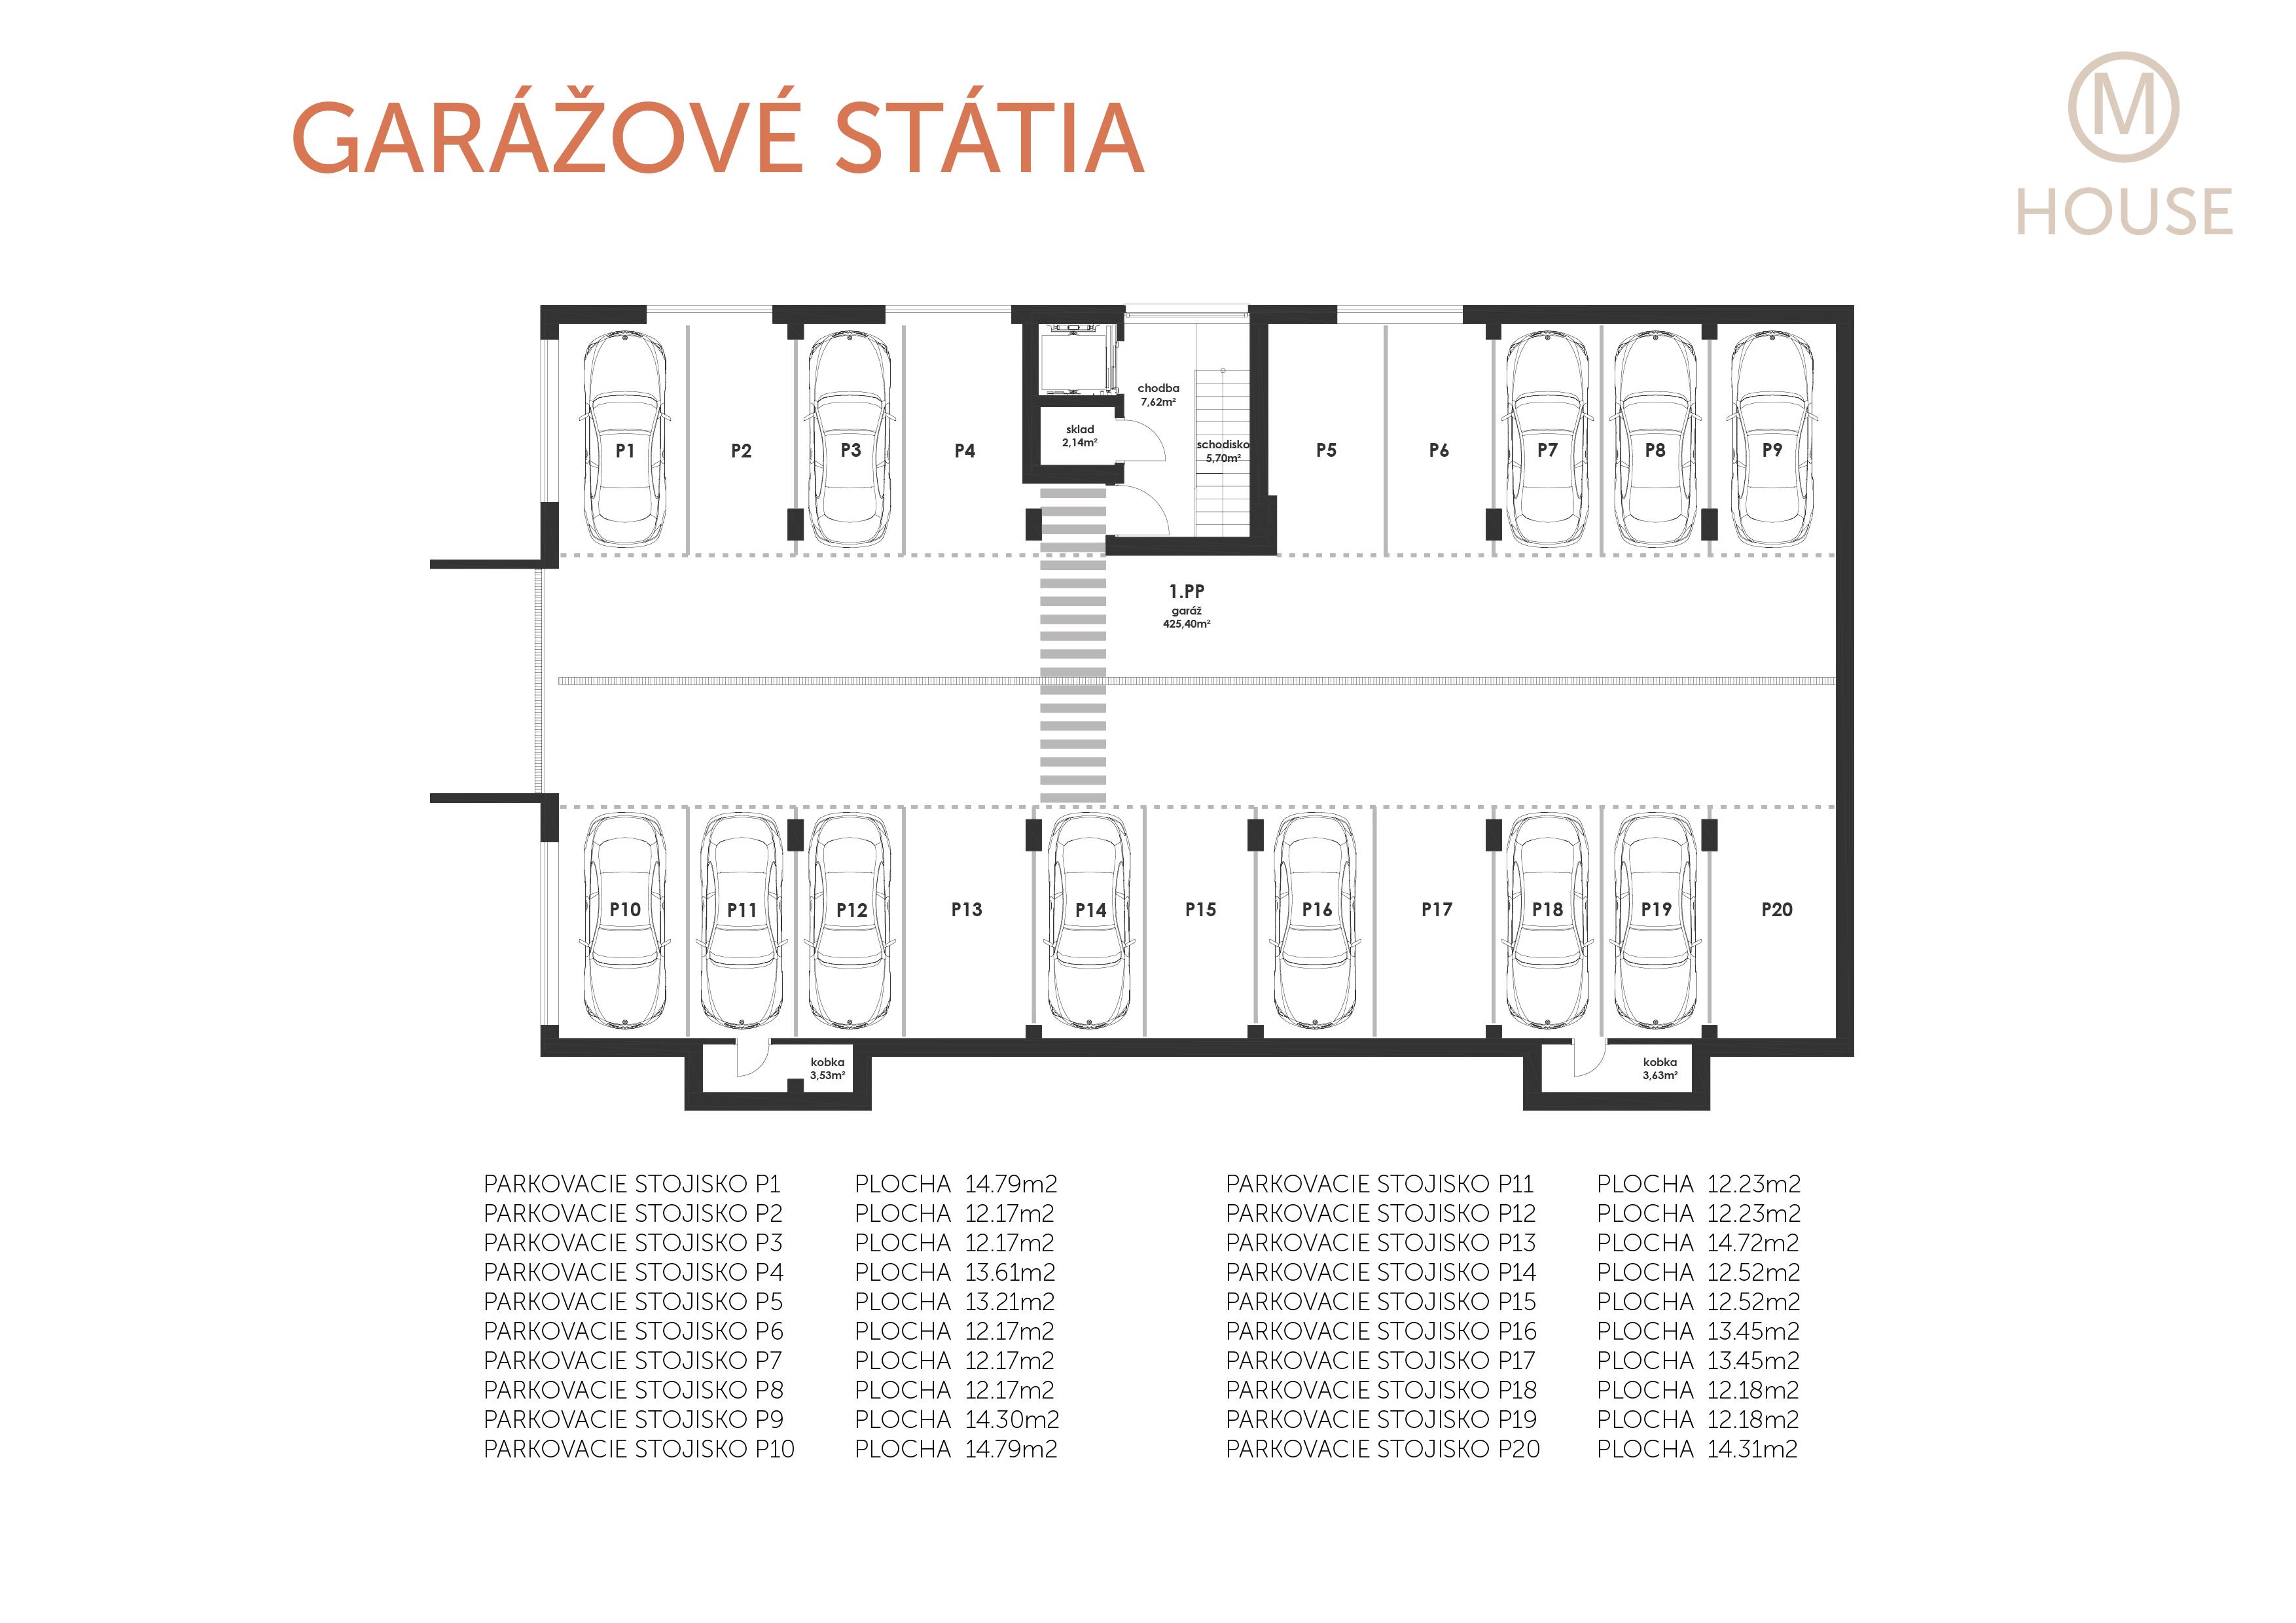 NOVOSTAVBA 2 IZBOVÝ, M-HOUSE, MALACKY CENTRUM, úžitková 60 M2, záhrada 20 M2-10